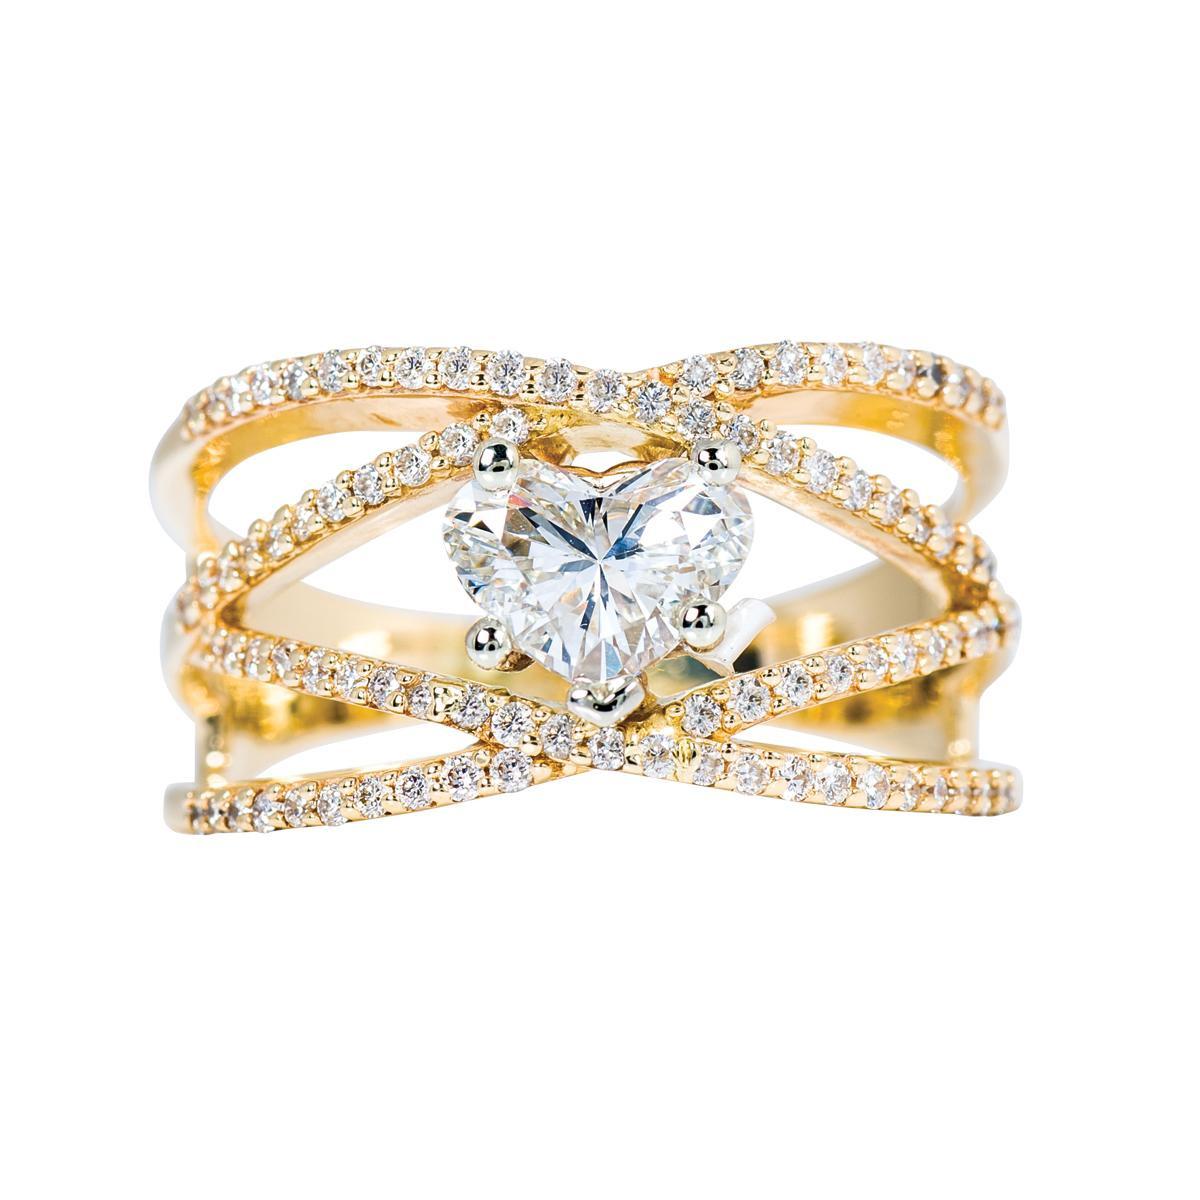 Vintage 1.70 CTW Heart Cut Diamond Ring